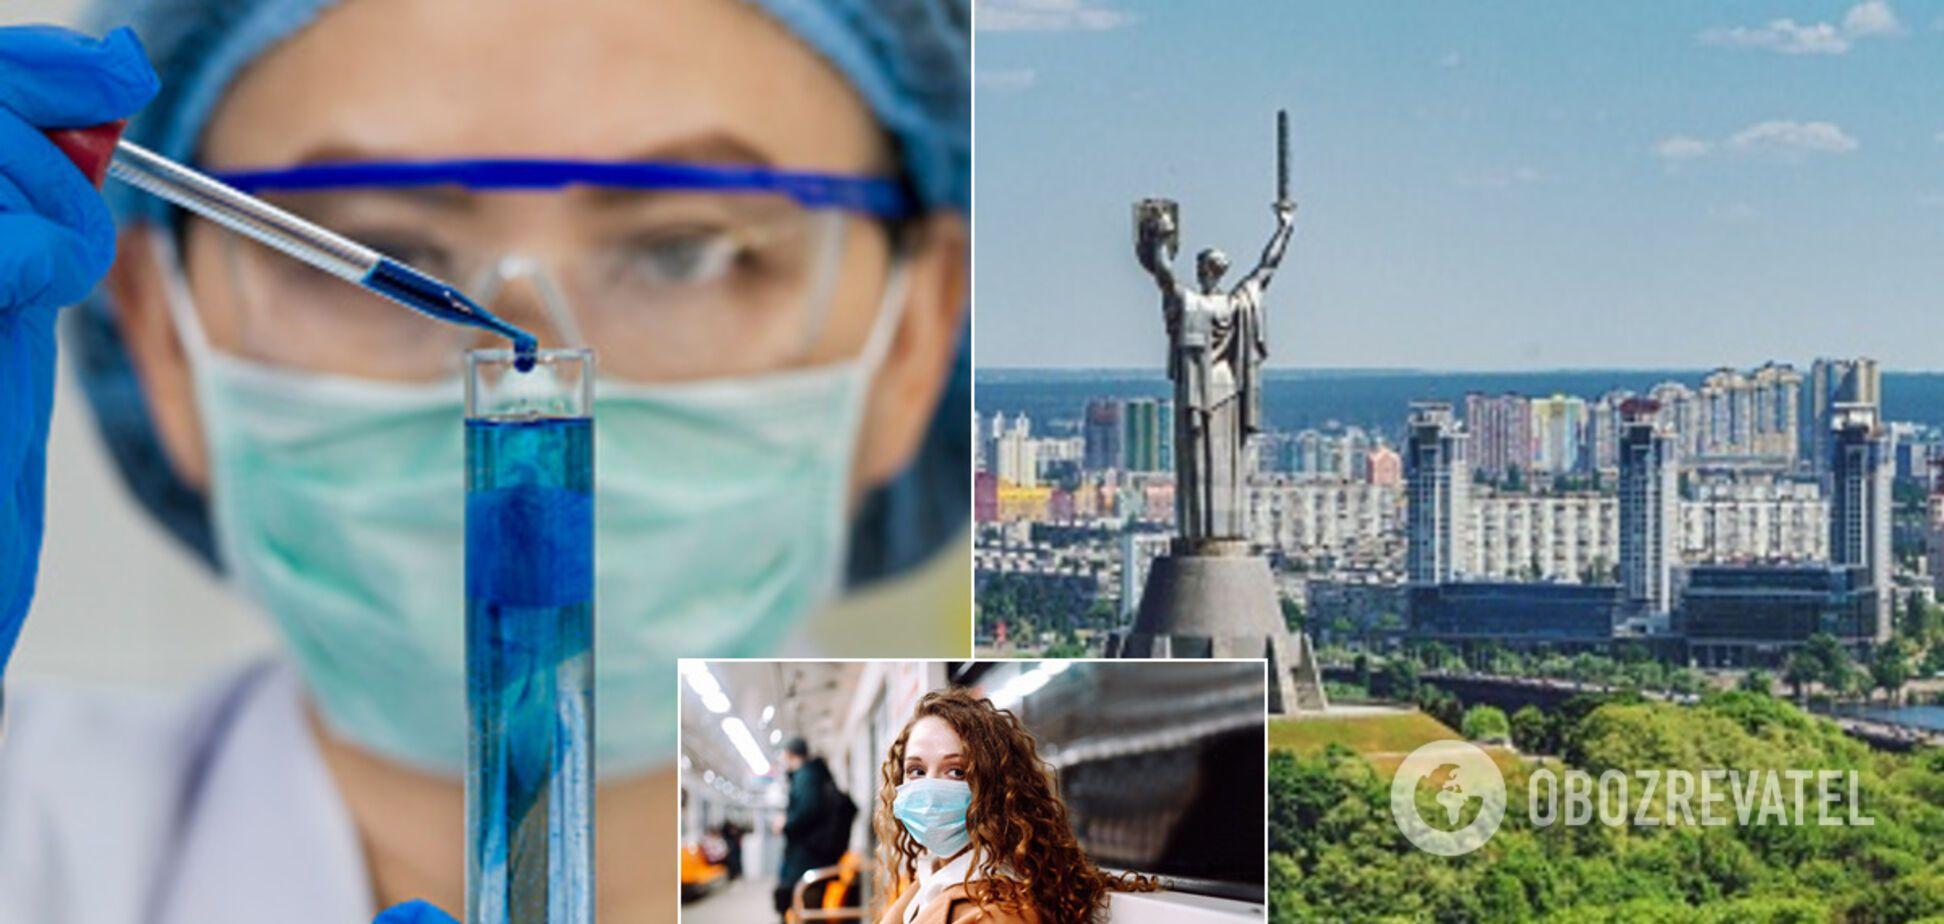 В Украине рекордное количество заболевших COVID-19 за сутки: появилась статистика Минздрава на 11 июня